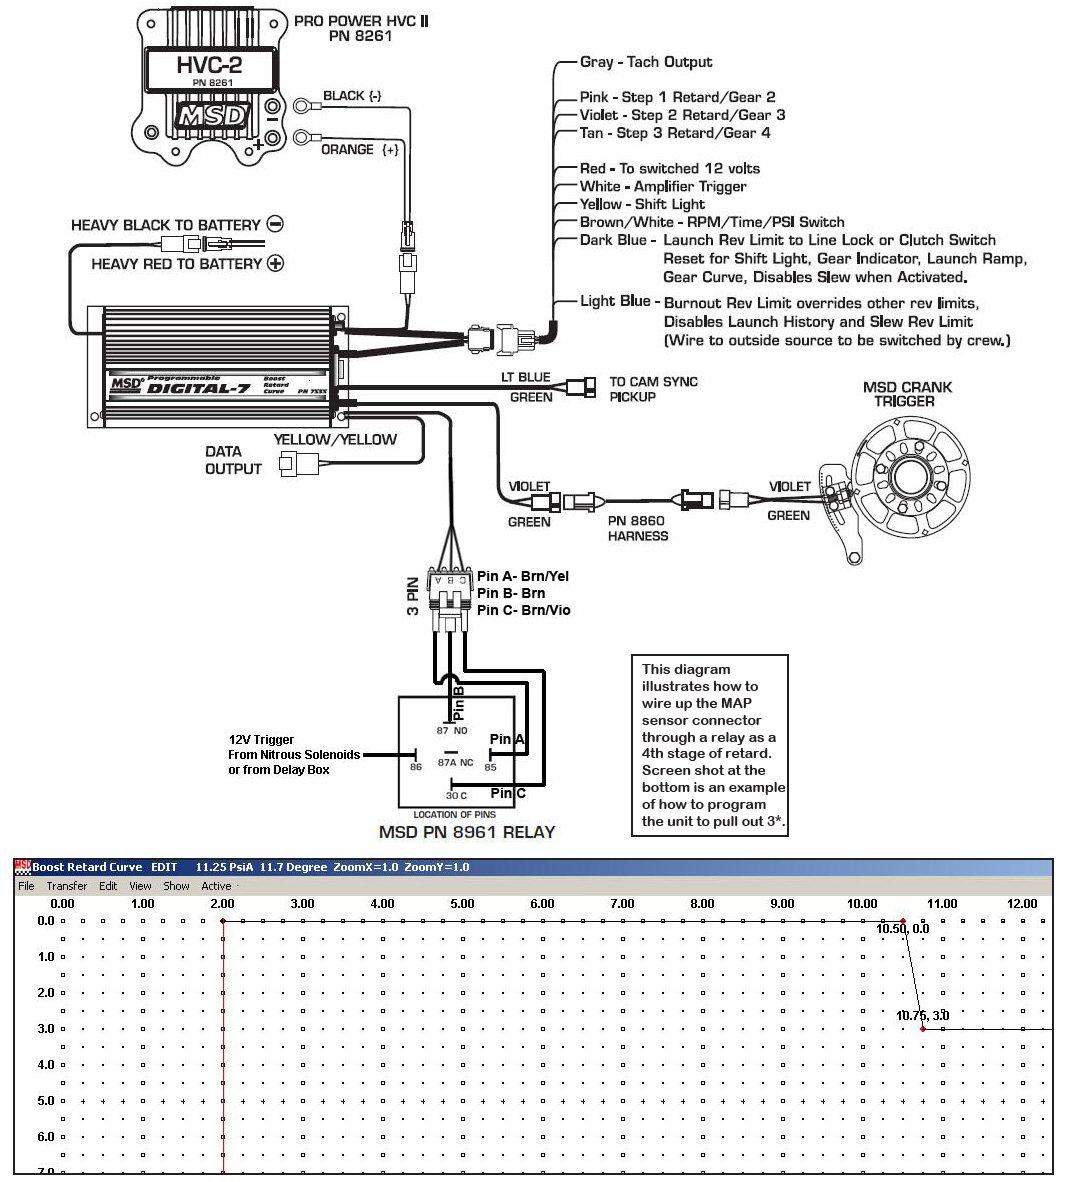 Nitrous Solenoid Wiring Diagram - Wiring Diagrams on